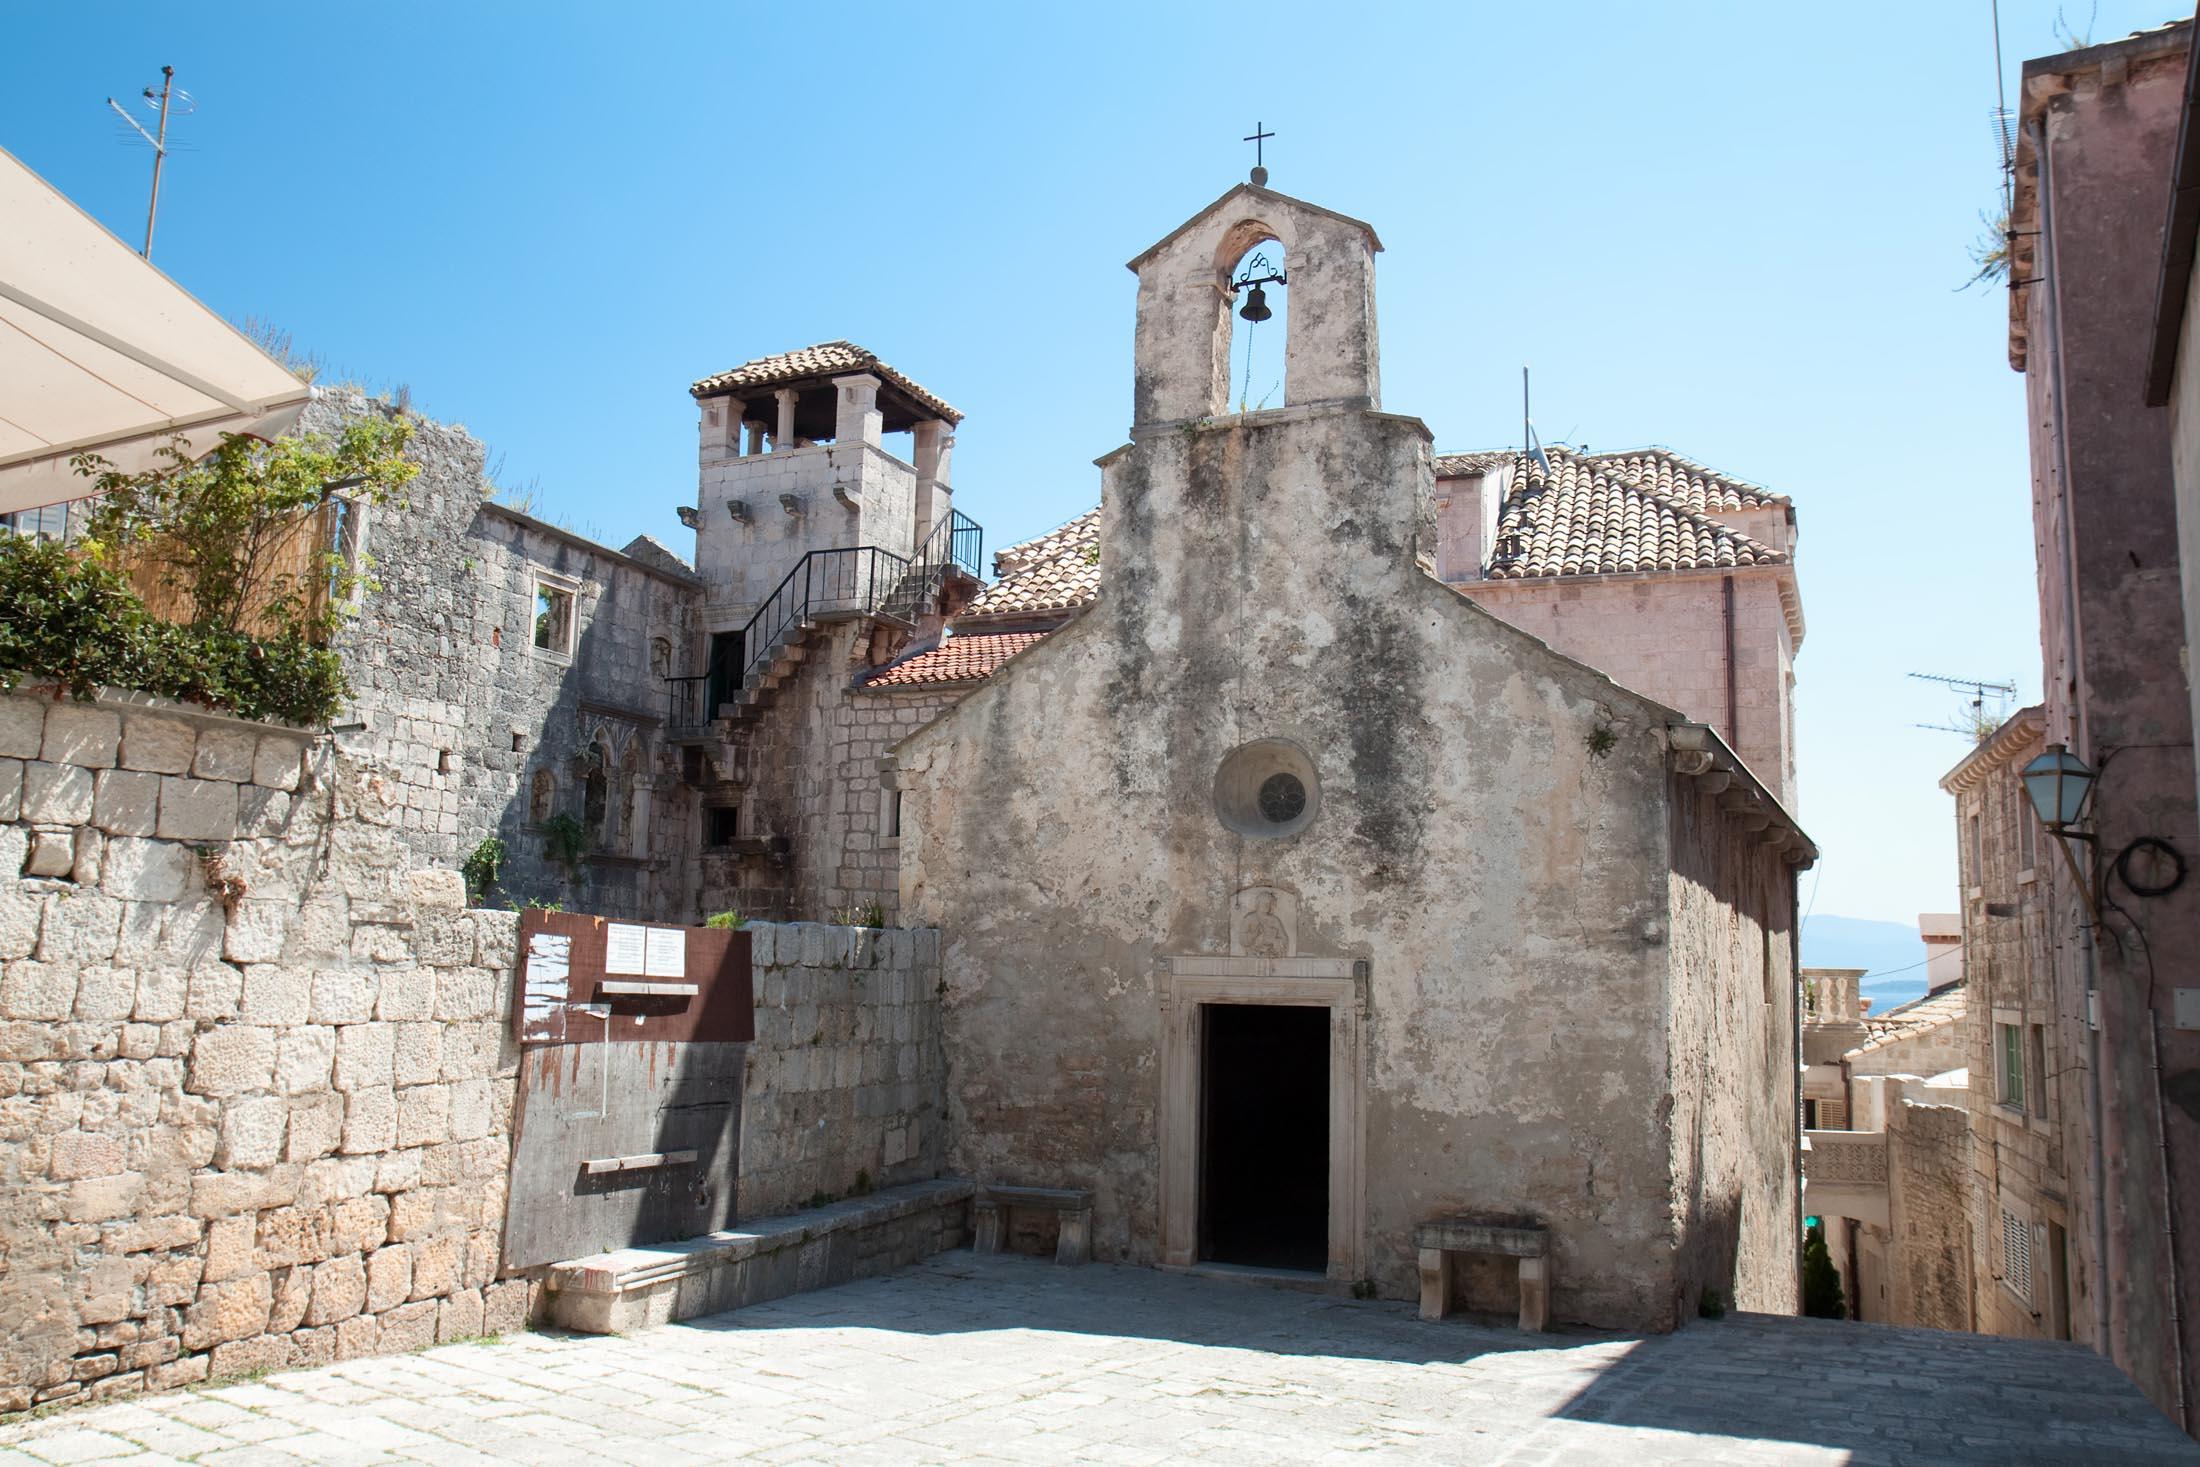 Church and Marco Polo tower in Korcula, Croatia.